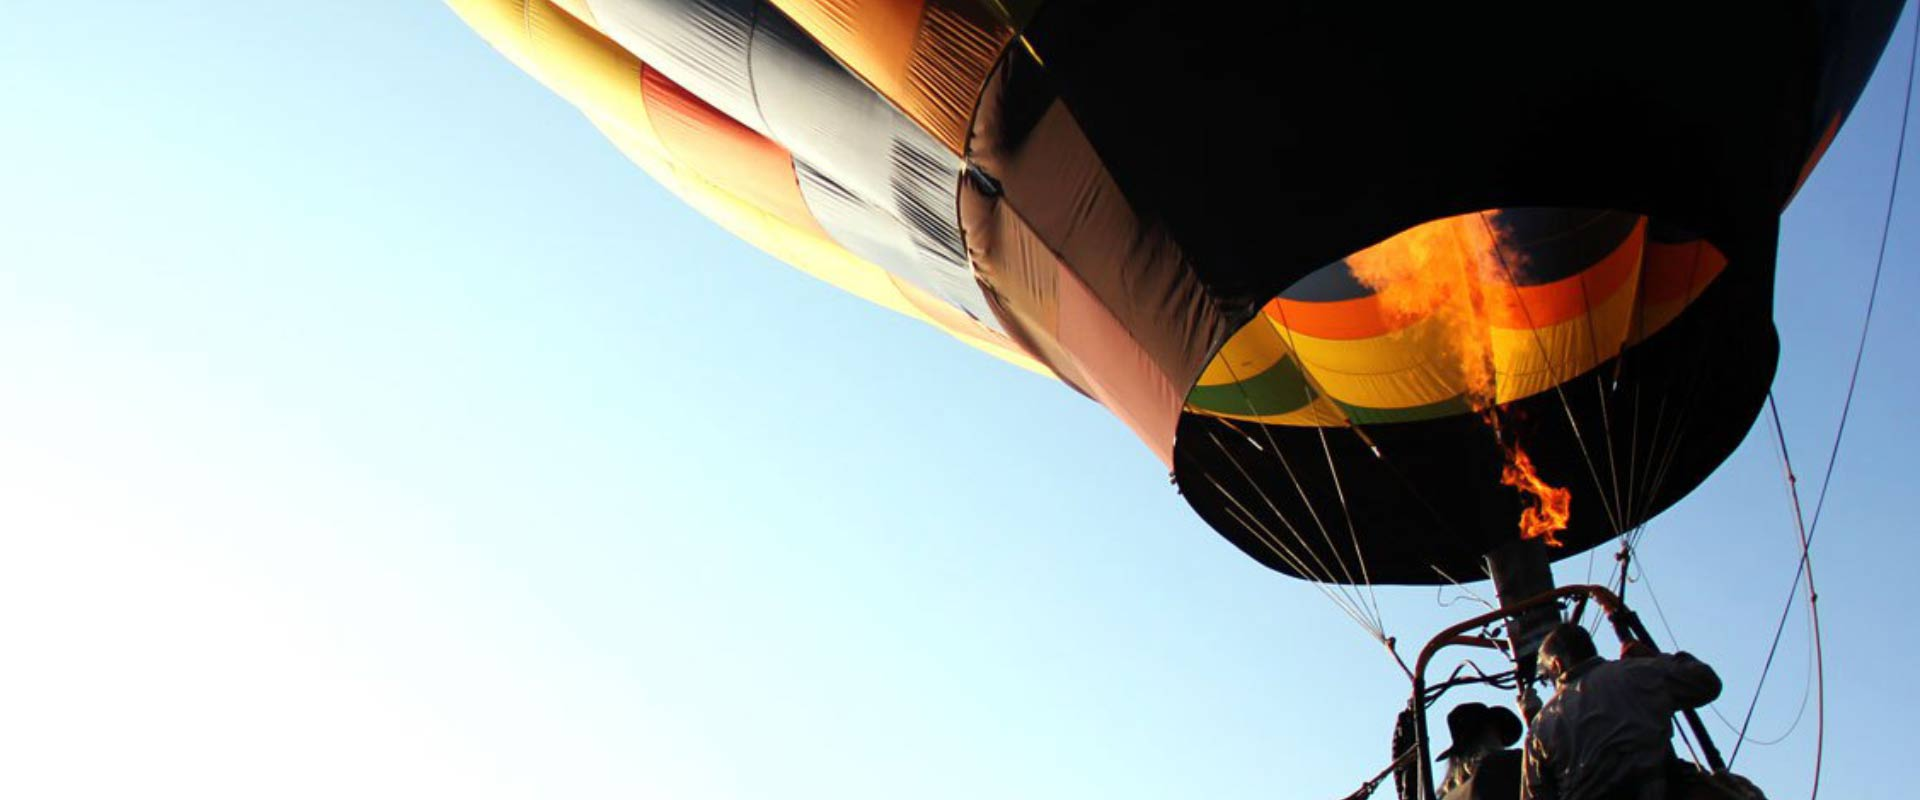 Hot Air Balloon Rides with Experienced Hot Air Balloon Pilots